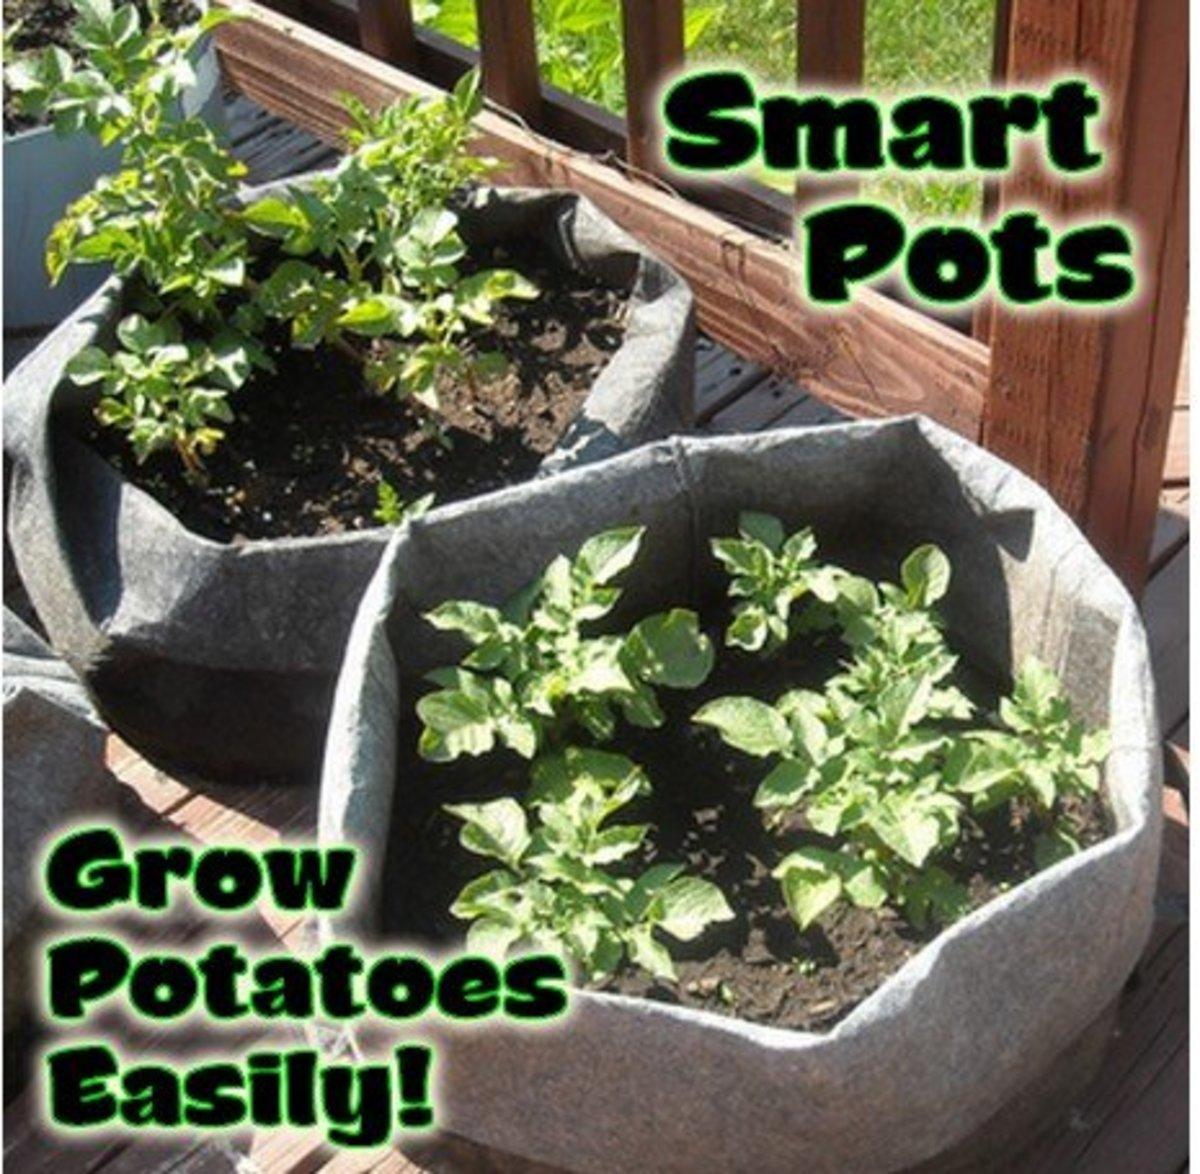 Smart Pots - Fabric Planting Bags Grow Potatoes Easily!